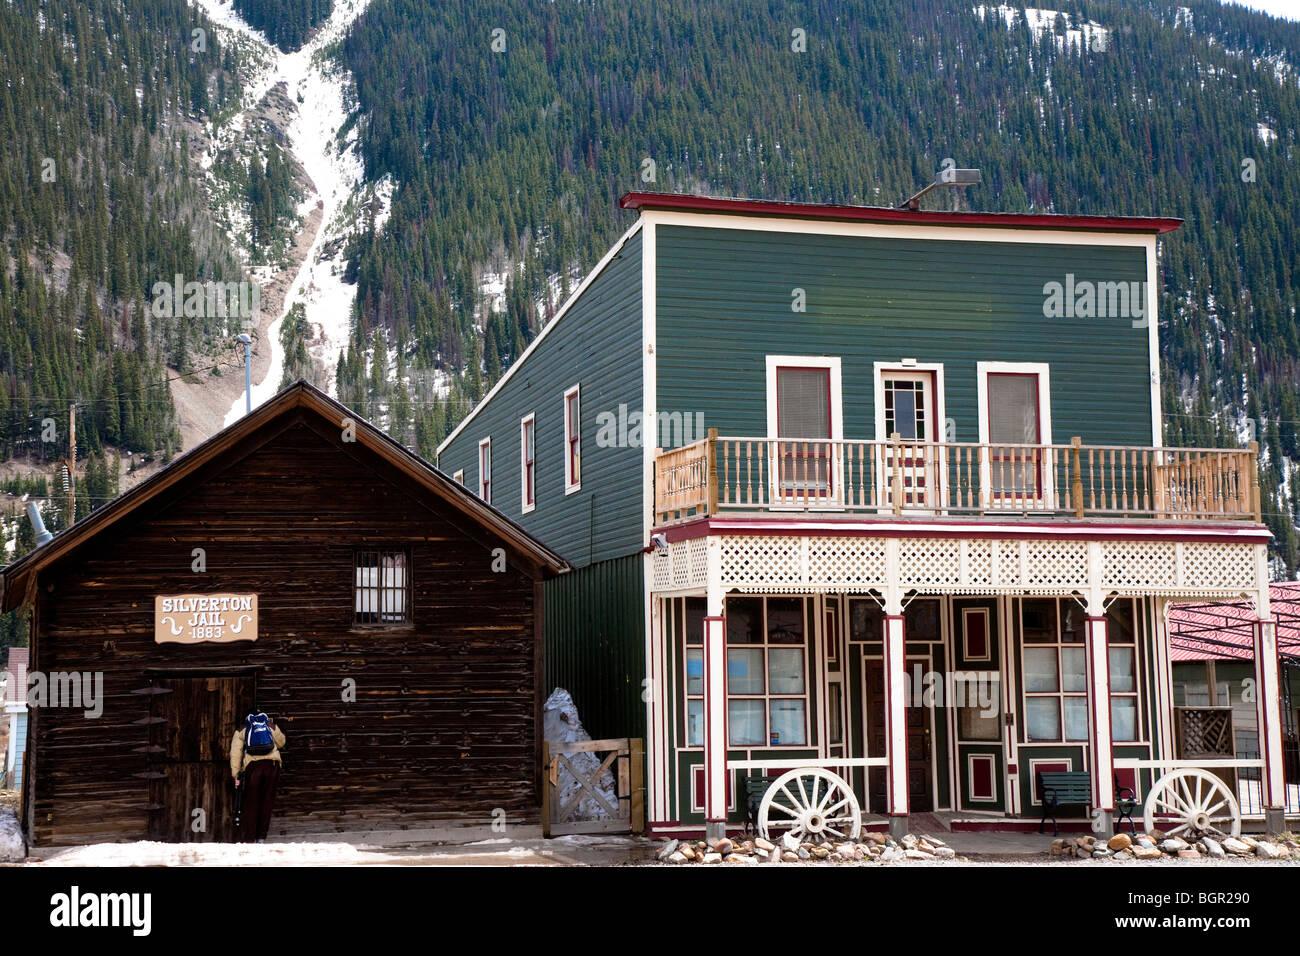 La vecchia San Juan County Jail house Silverton, old west città mineraria, San Juan County Colorado, STATI UNITI Foto Stock